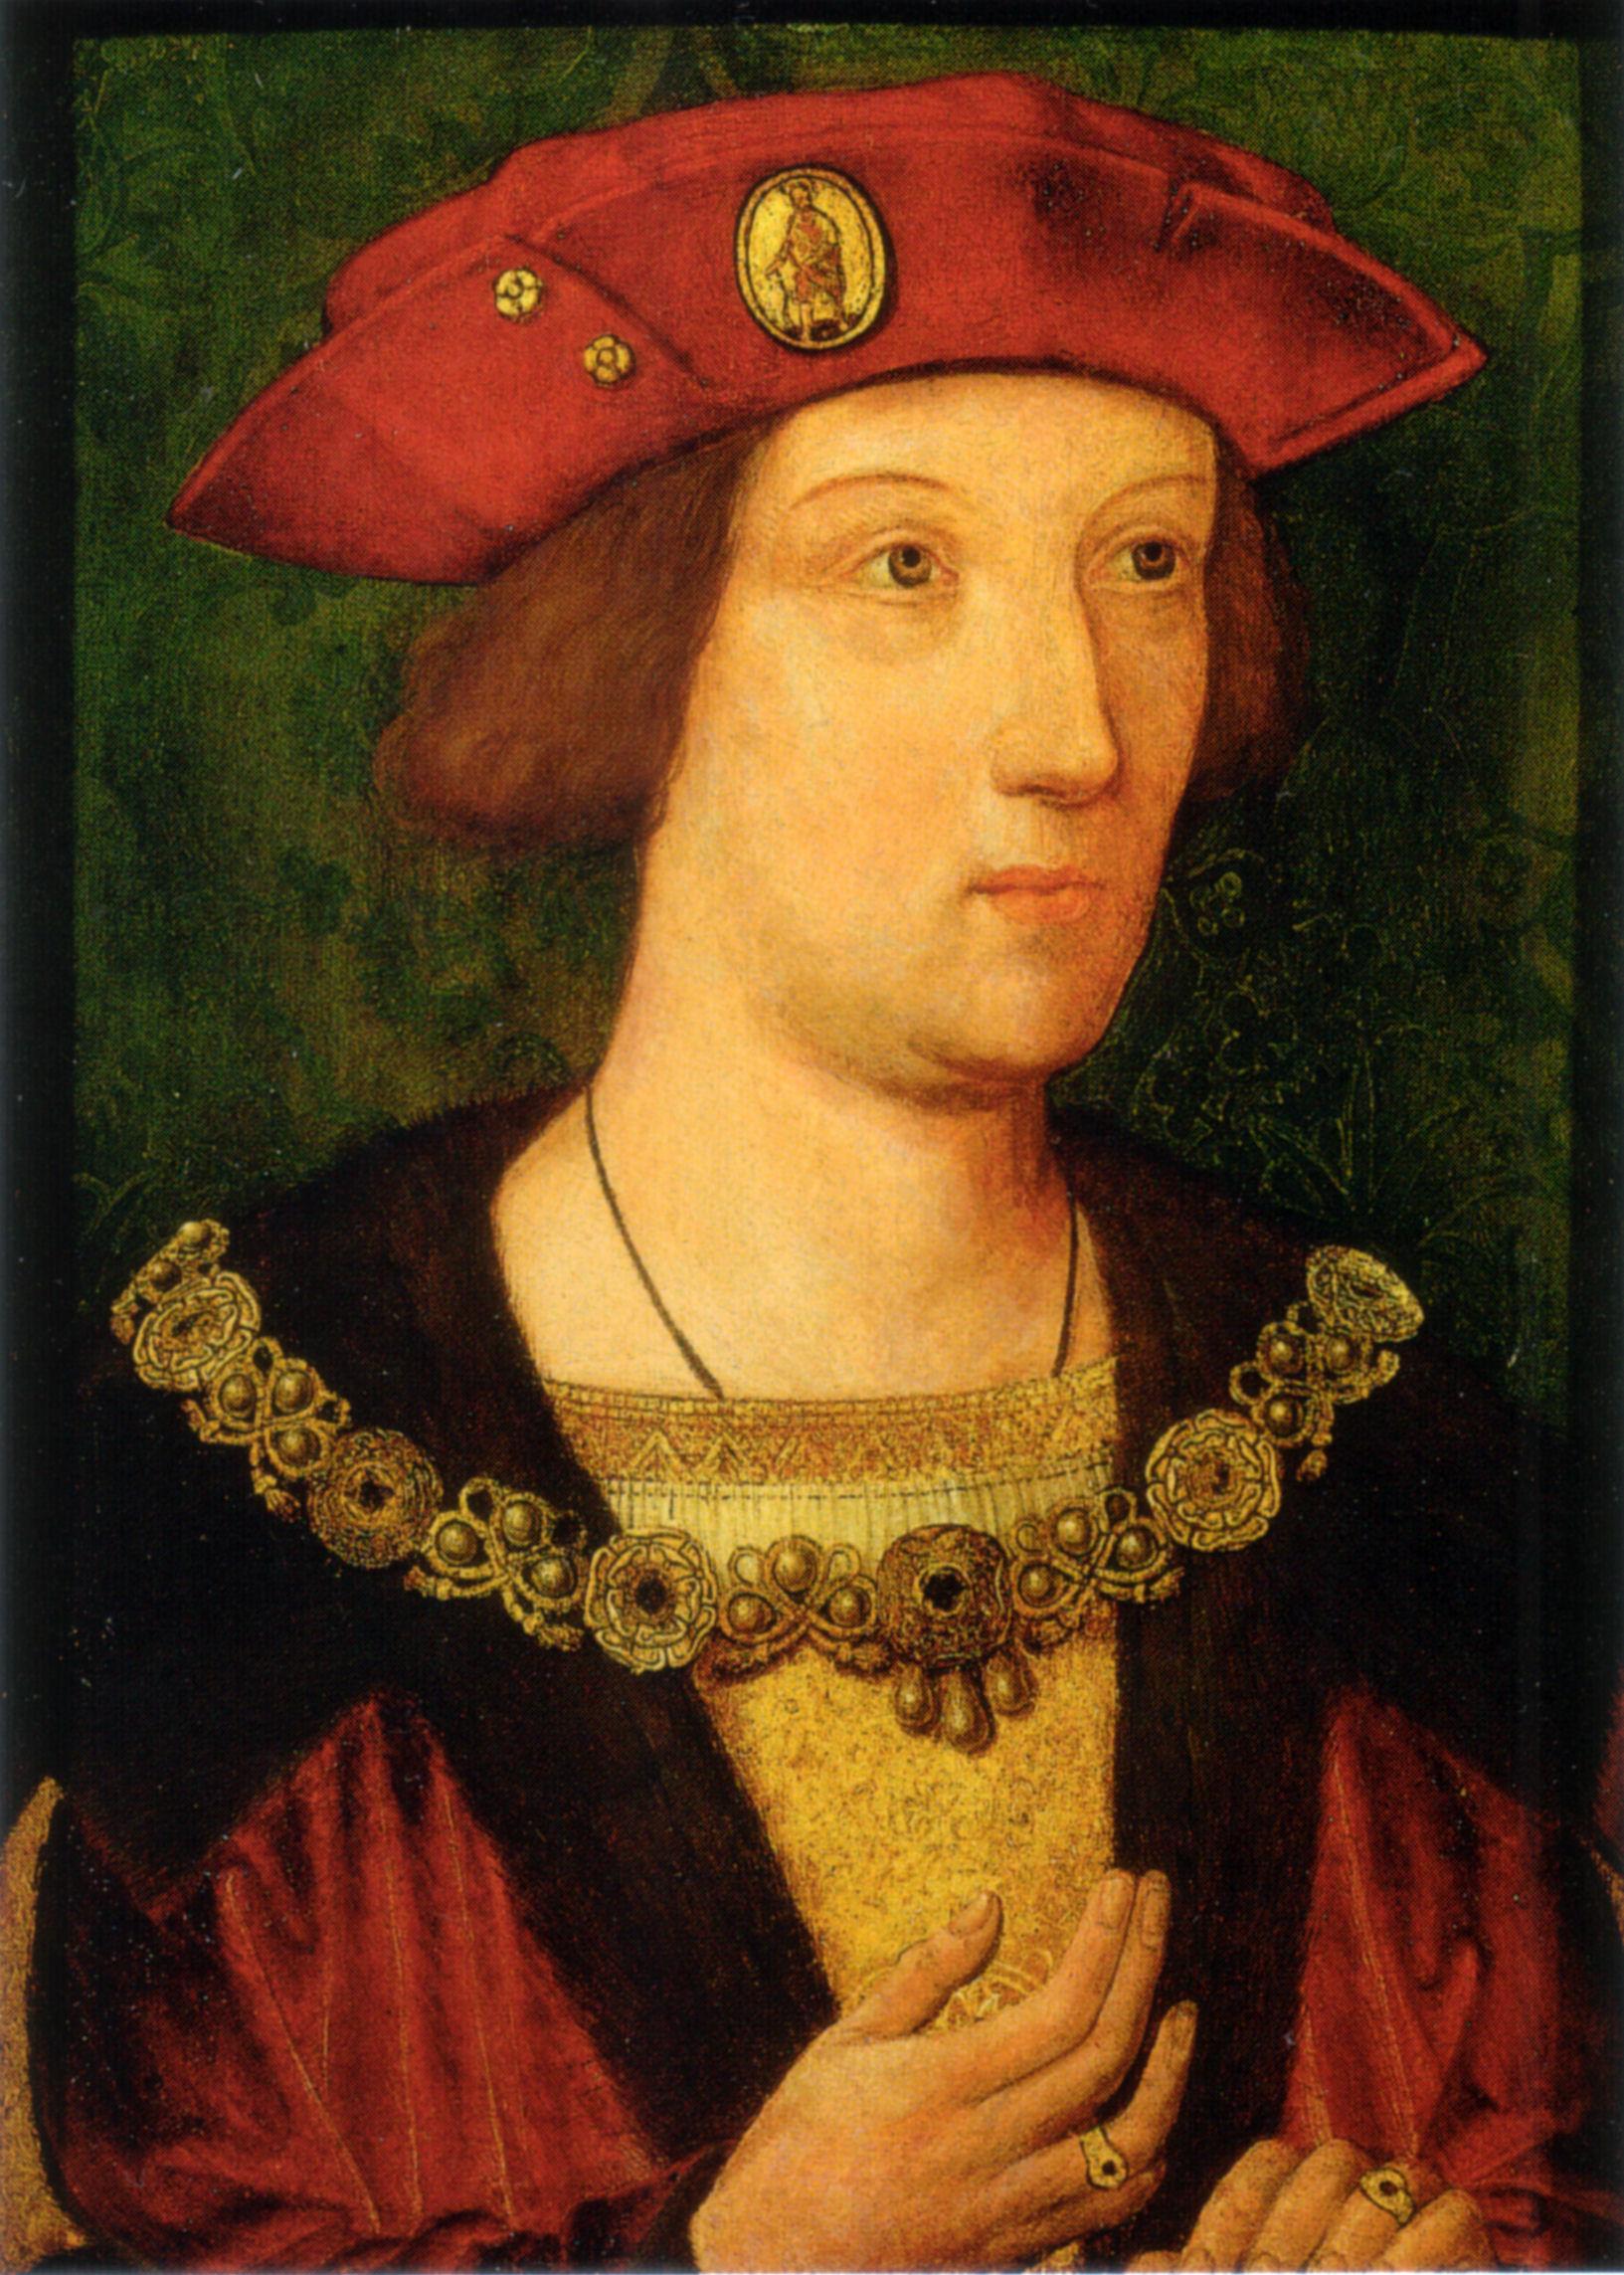 Arthur-Prince-of-Wales-1486-1502